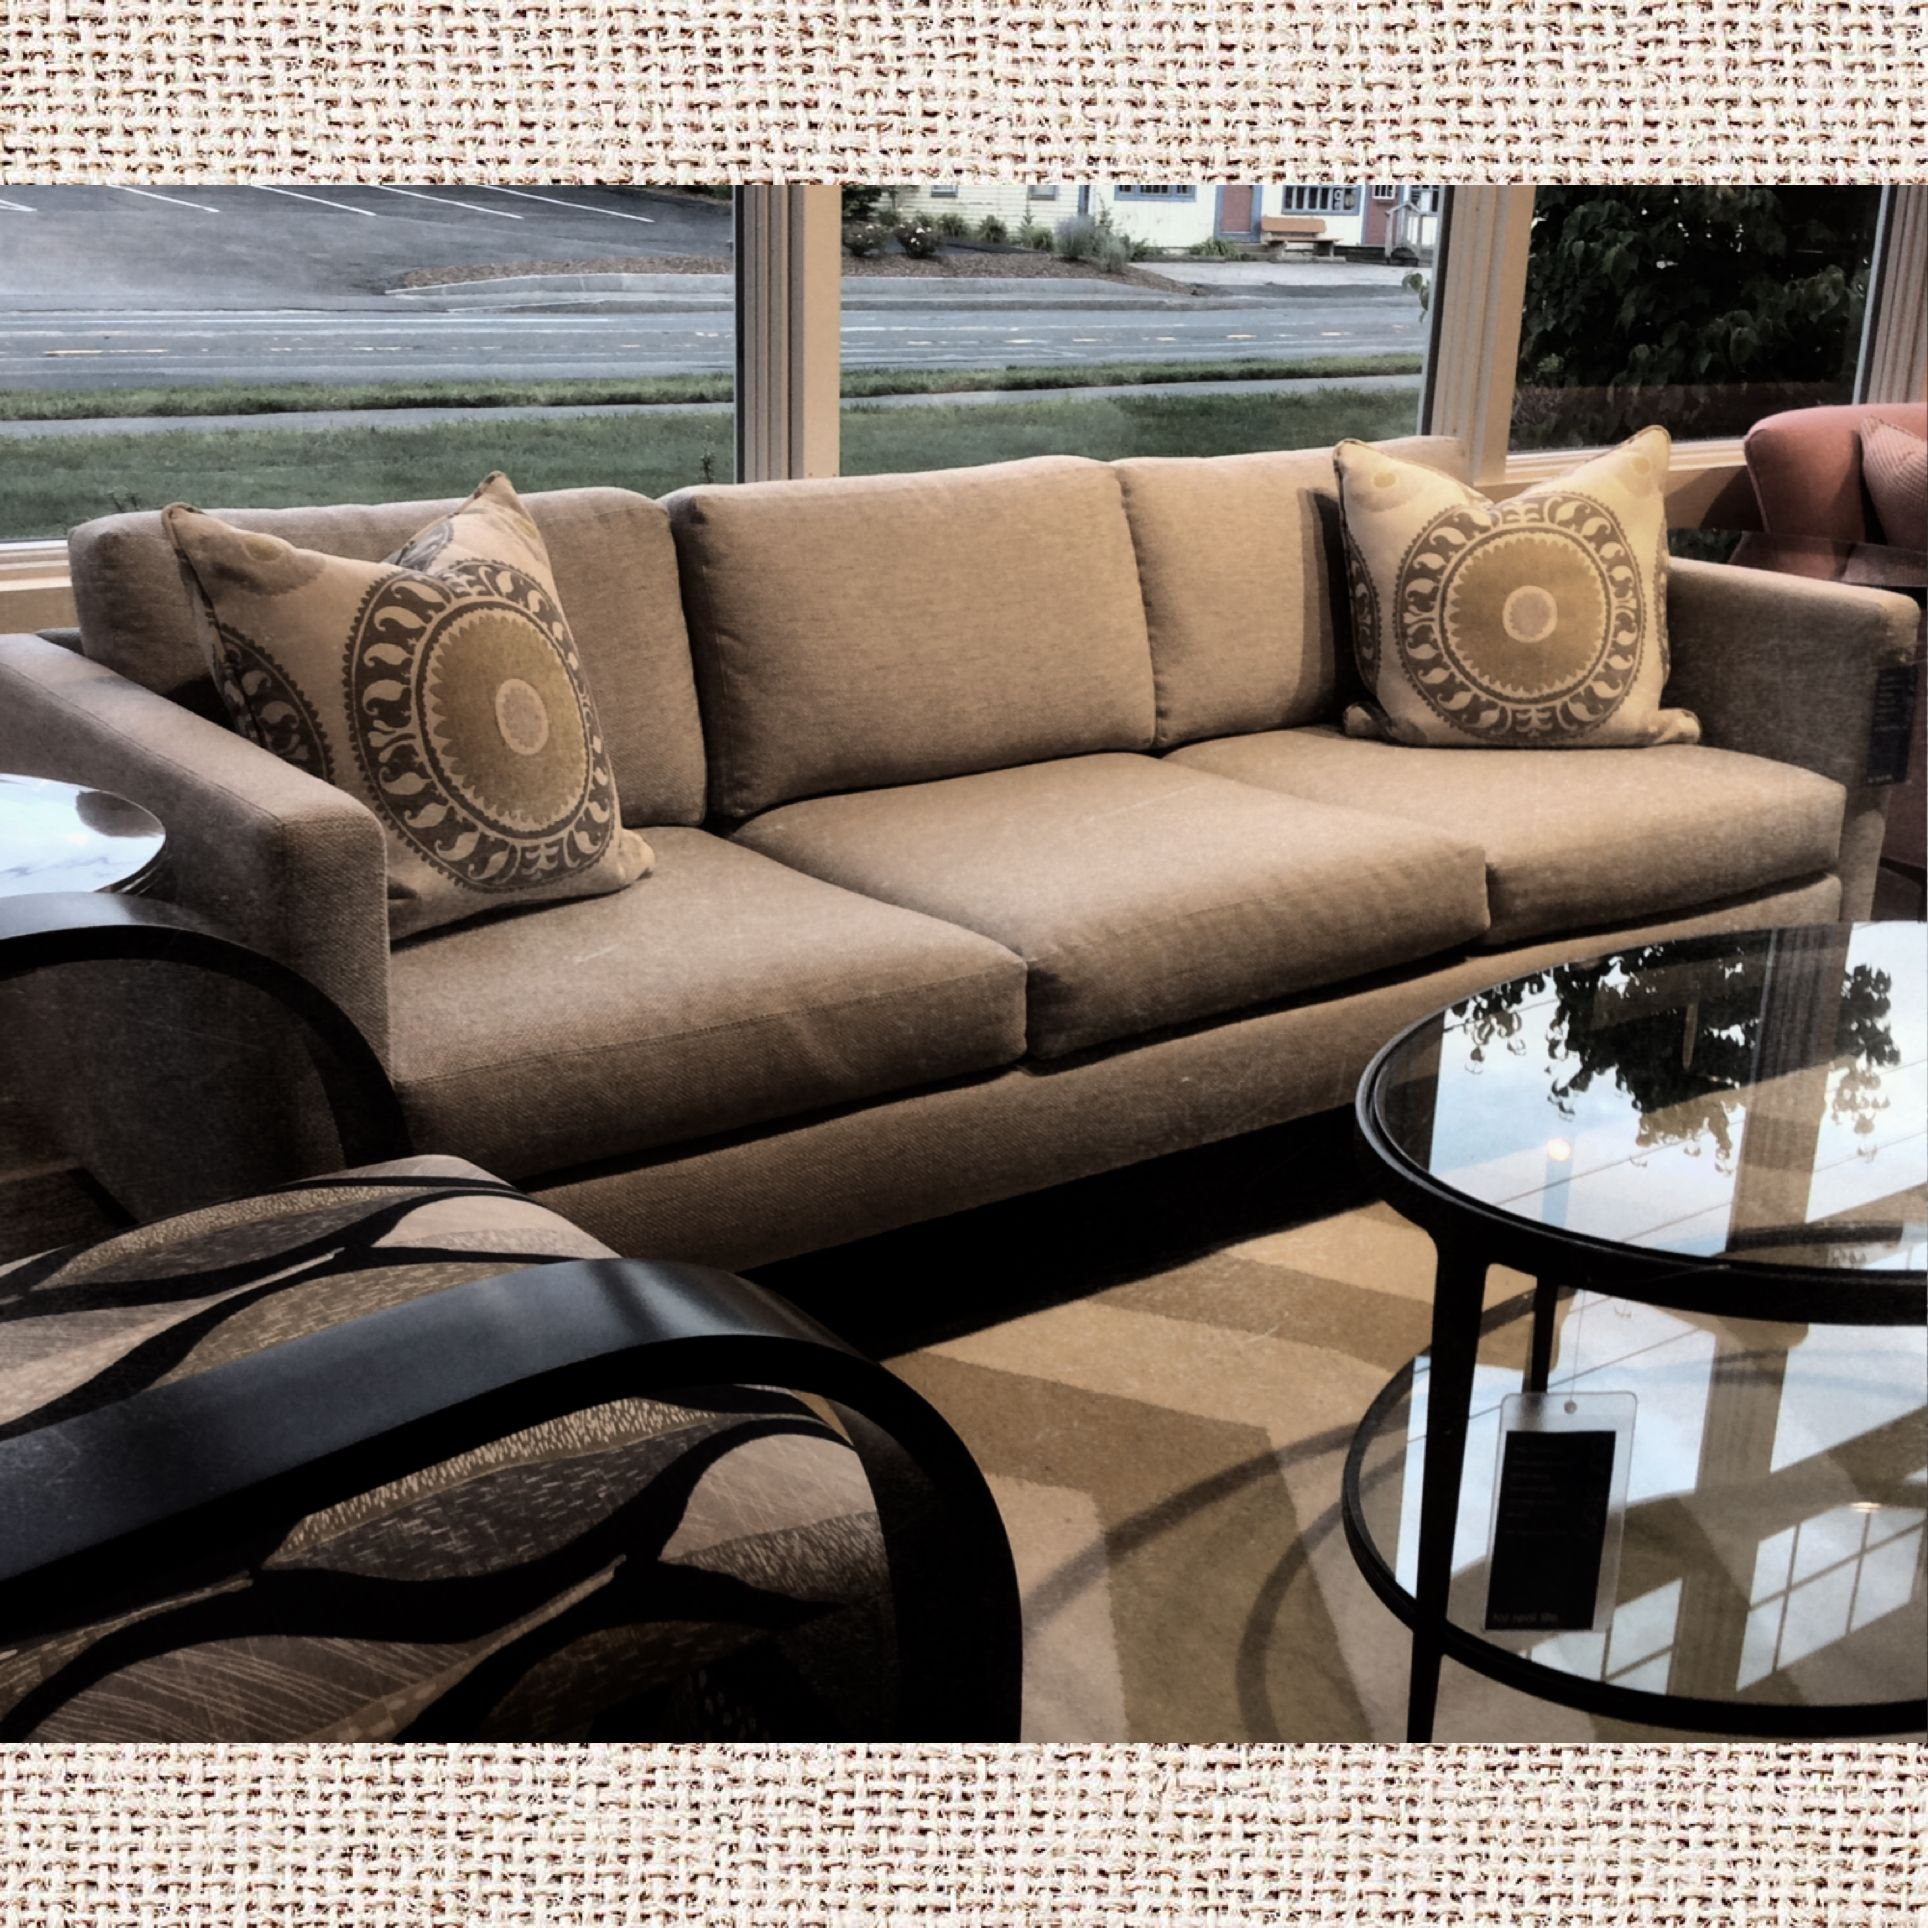 Design Clic From Circle Furniture Boston Bostoncirclessofas